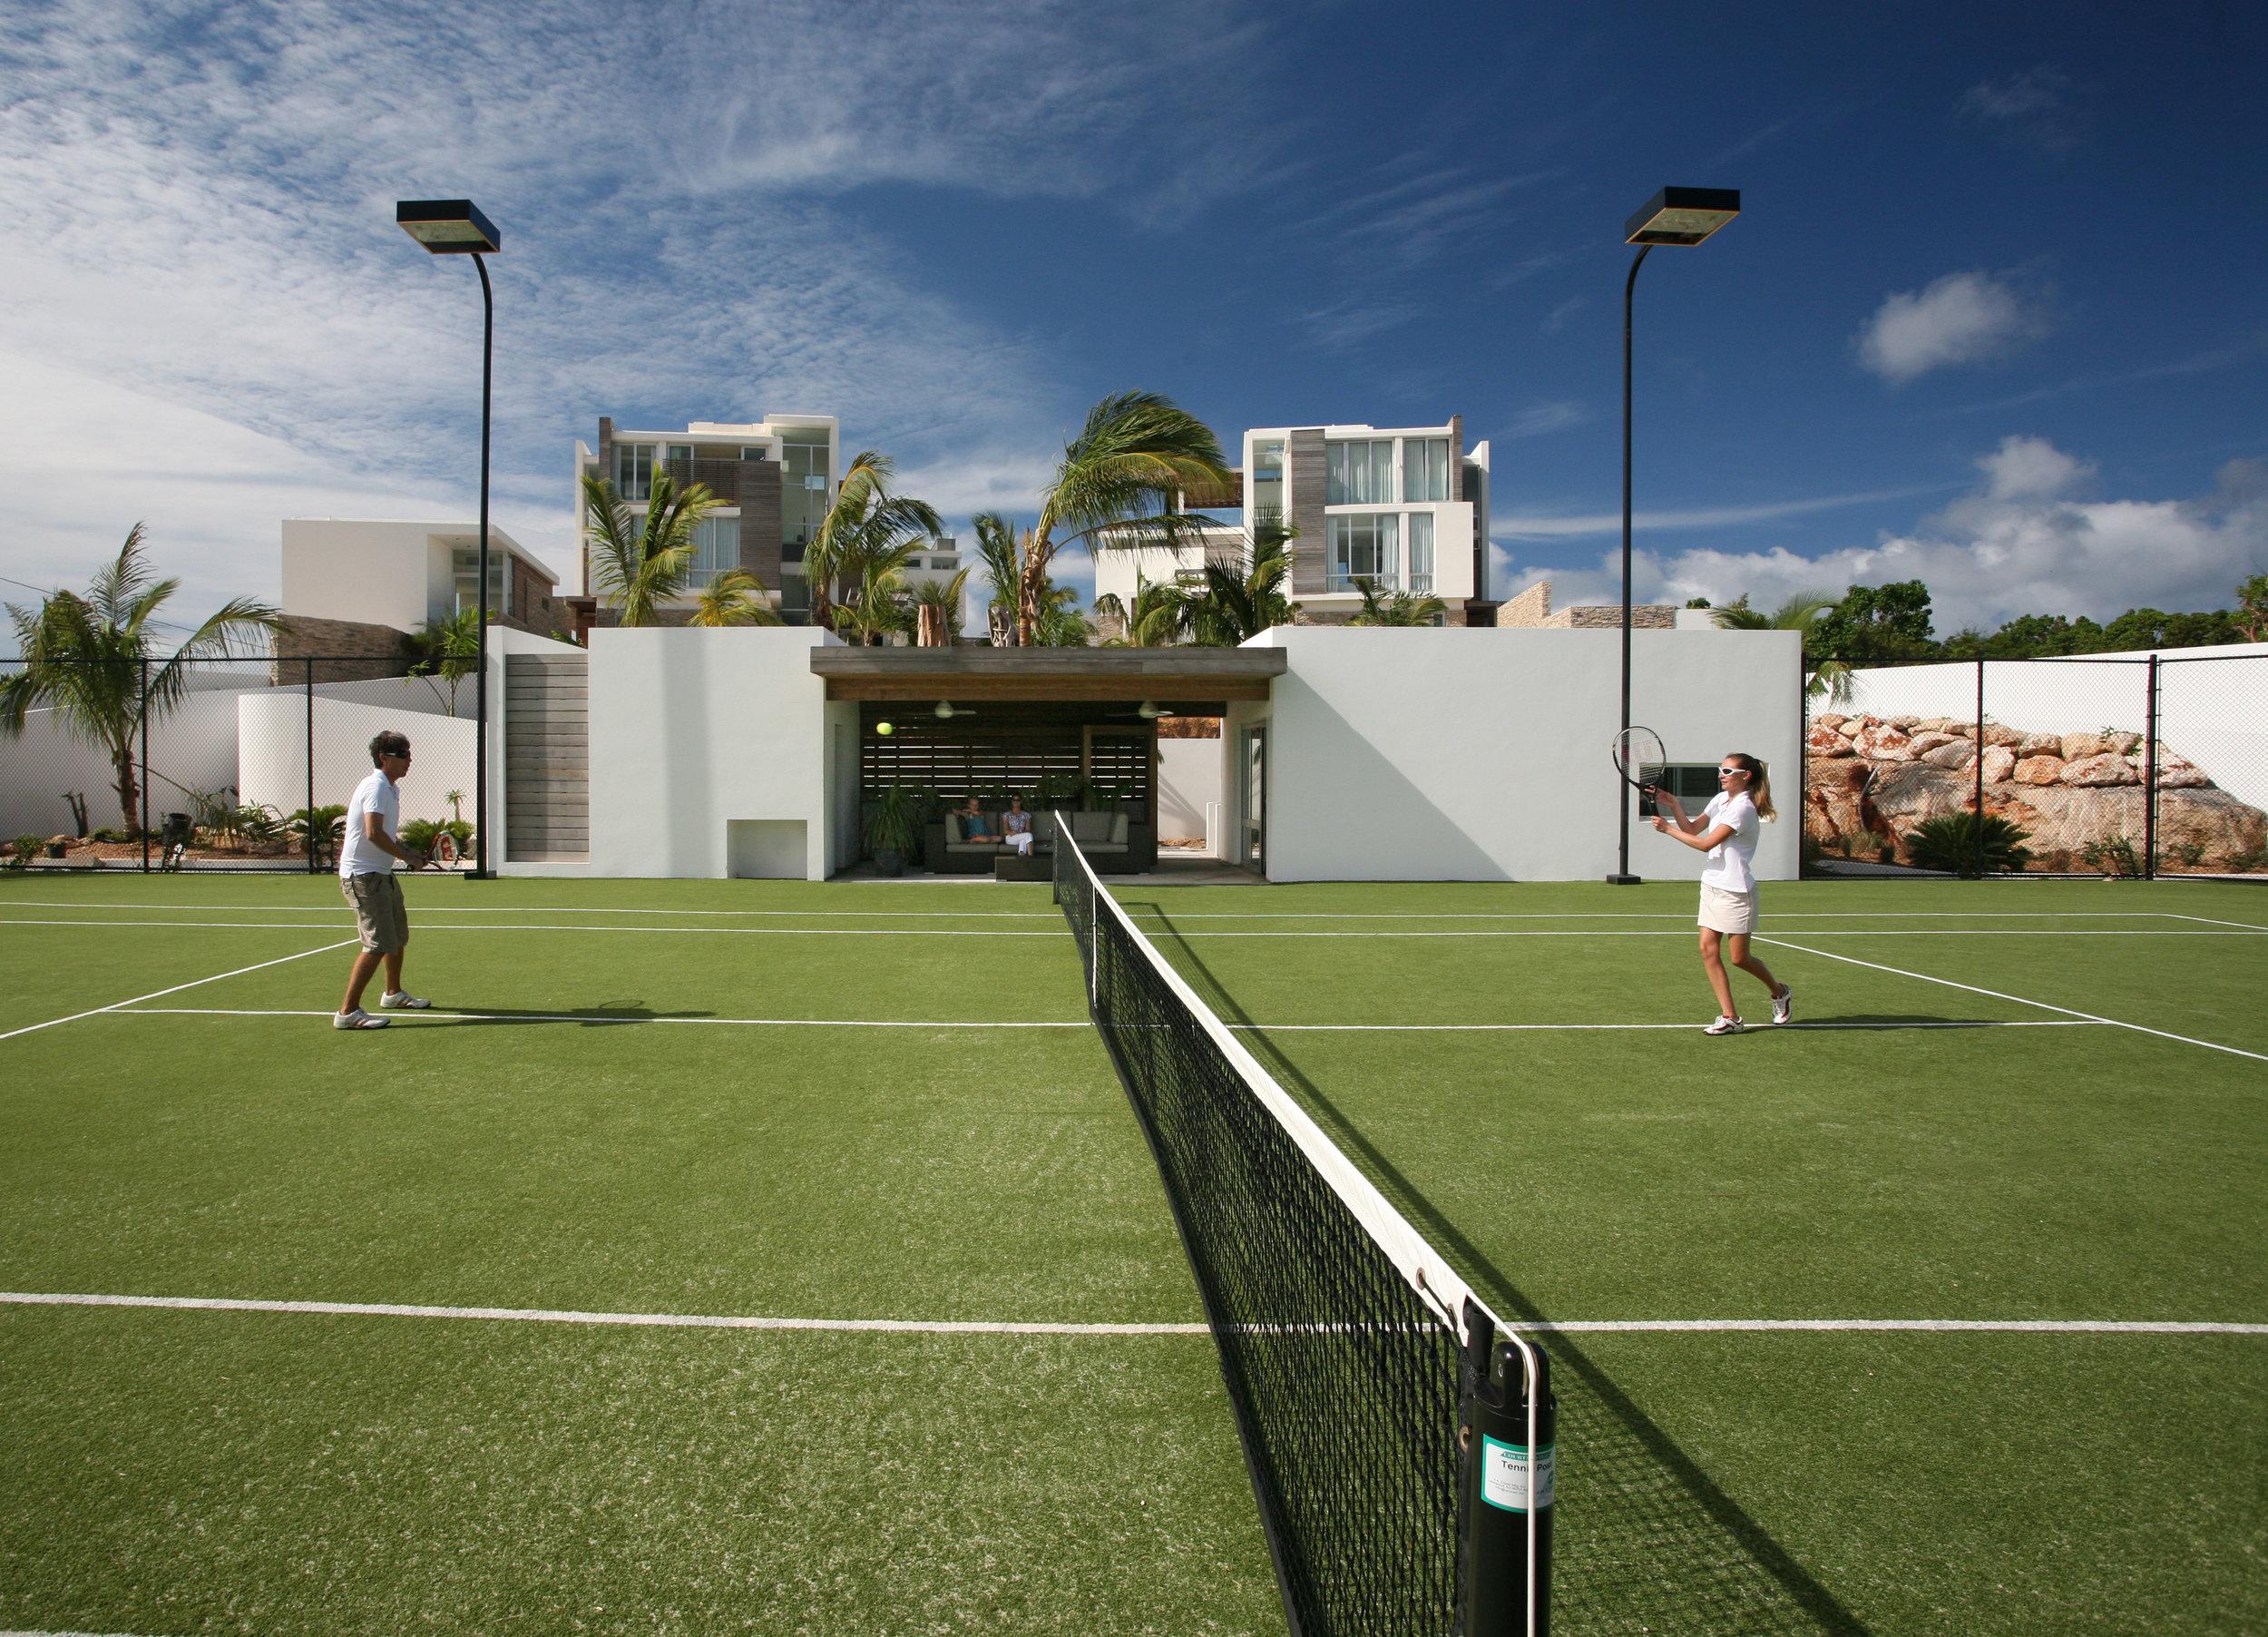 TERRAIN DE TENNIS & BASKETBALL